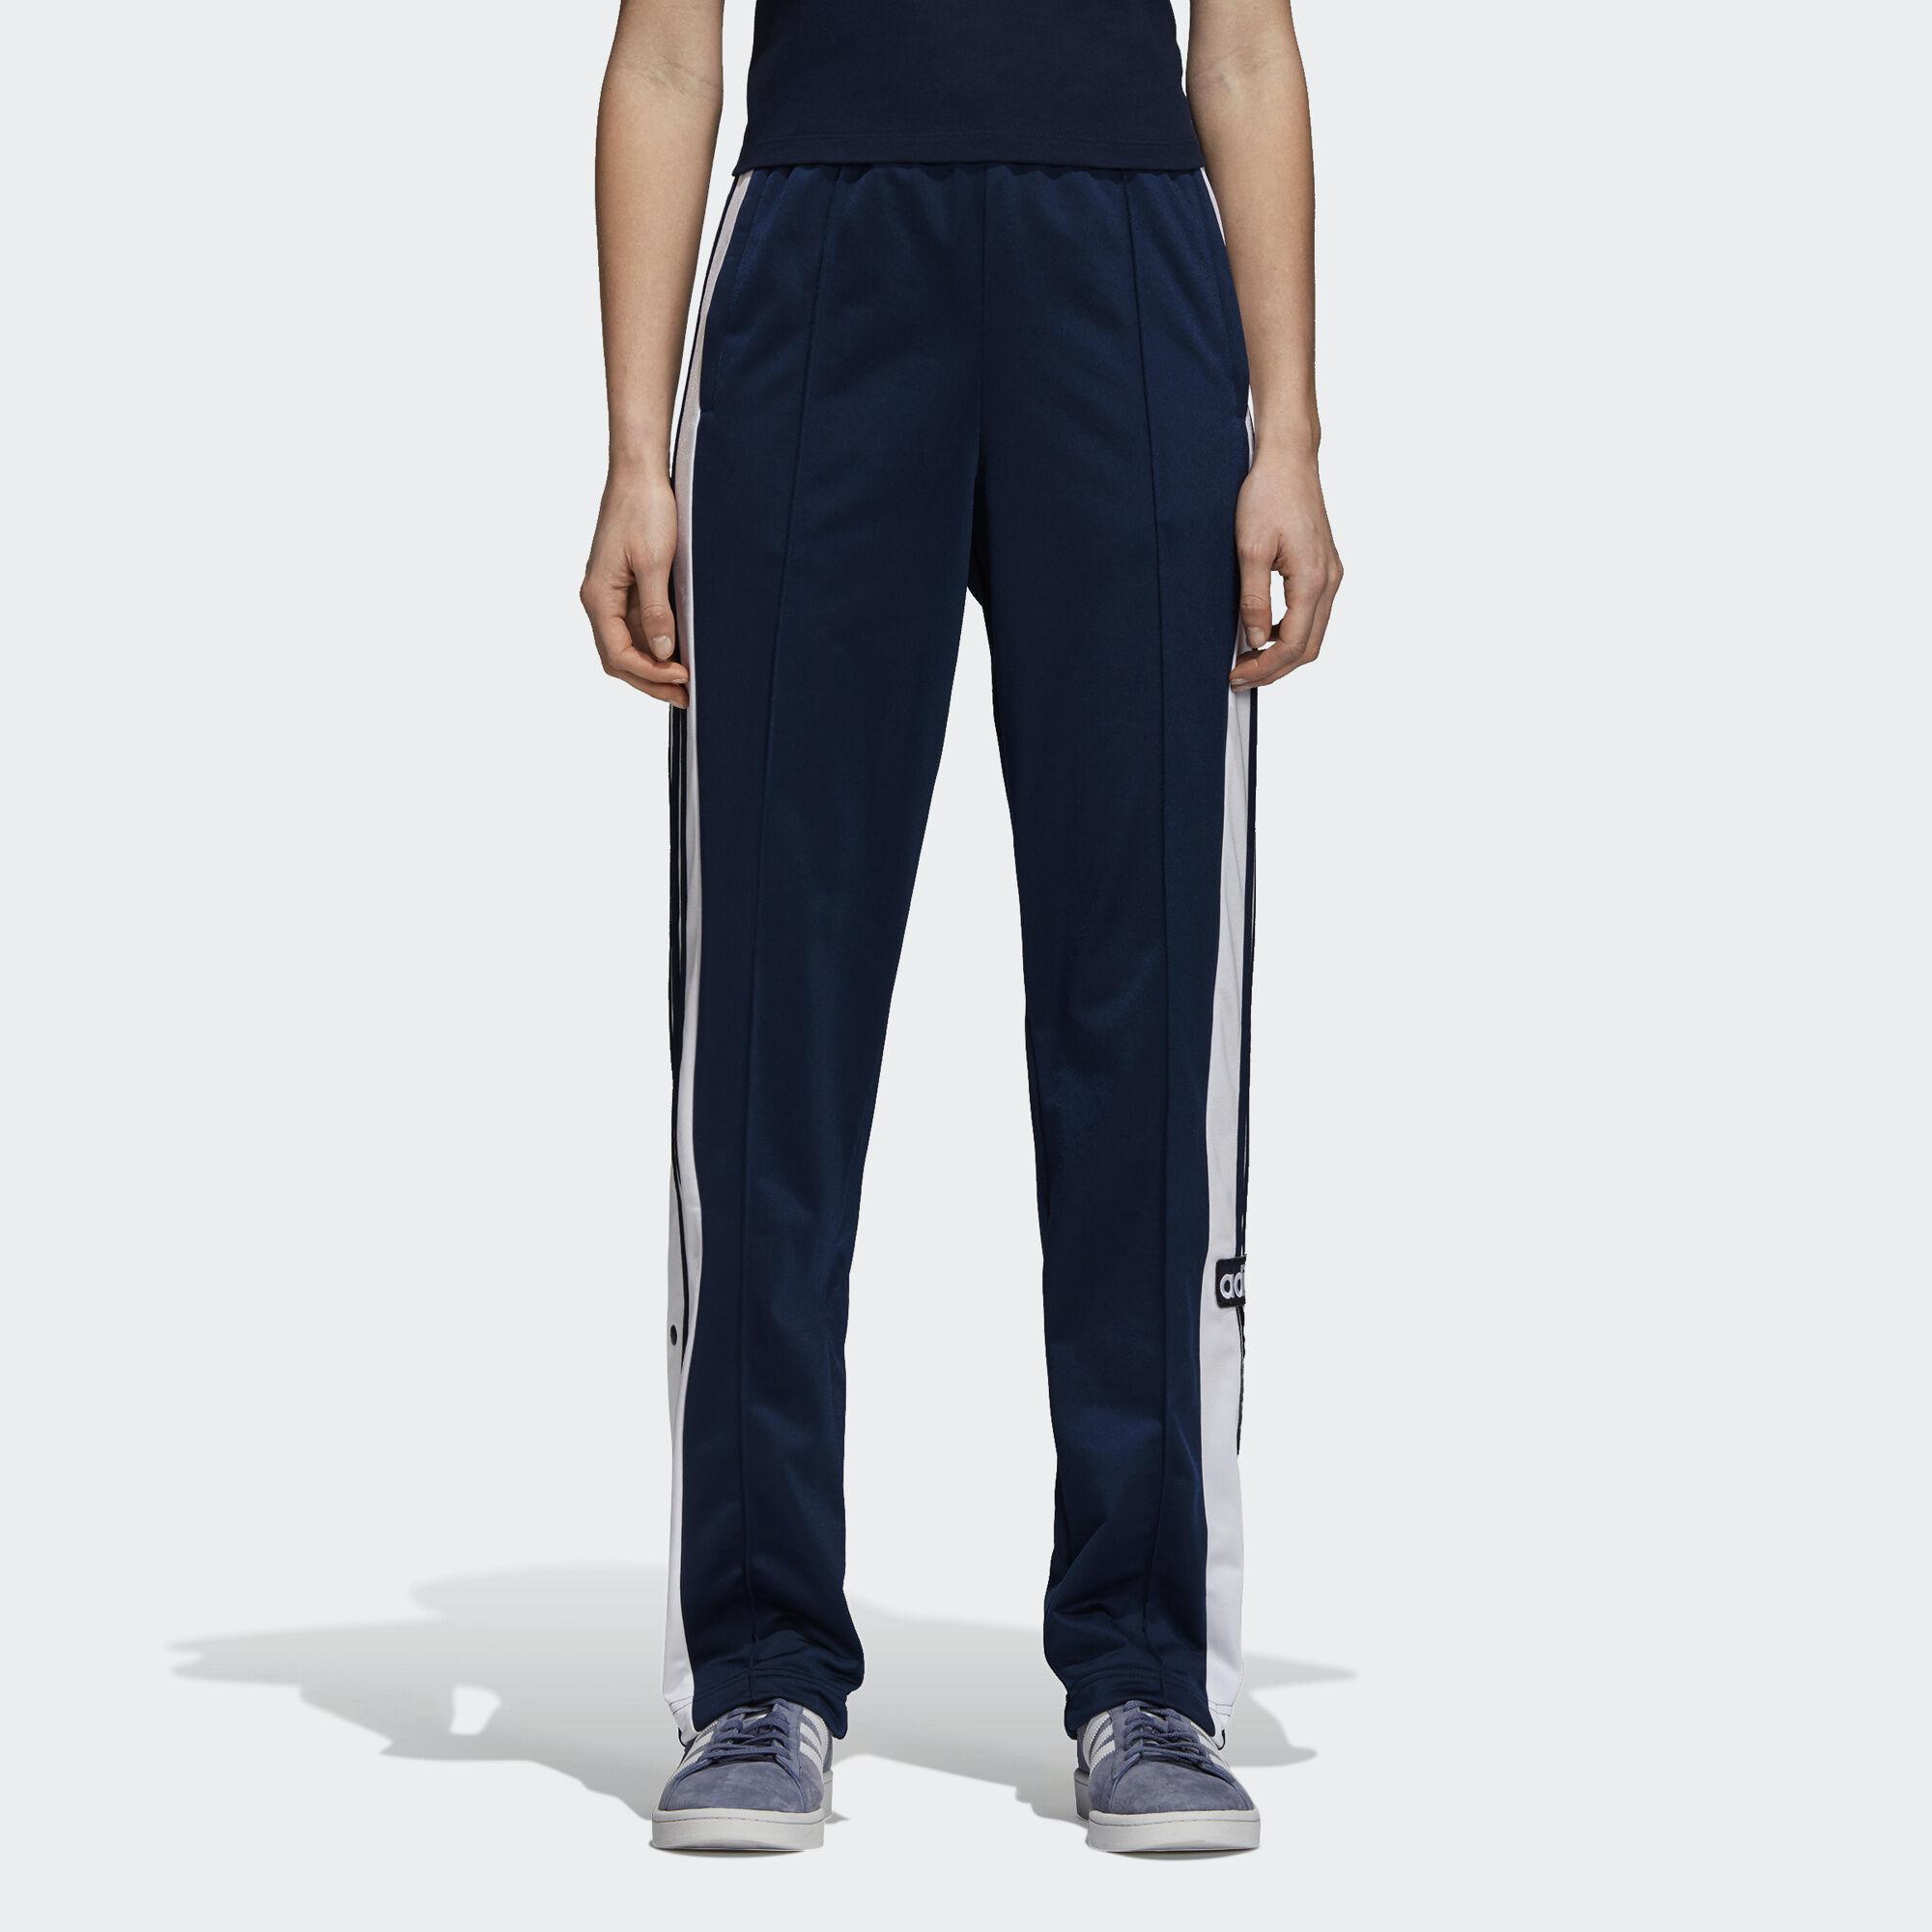 Adibreak Collegiate Pants Track Adidas Navy Dh3155 qZWOT4Of